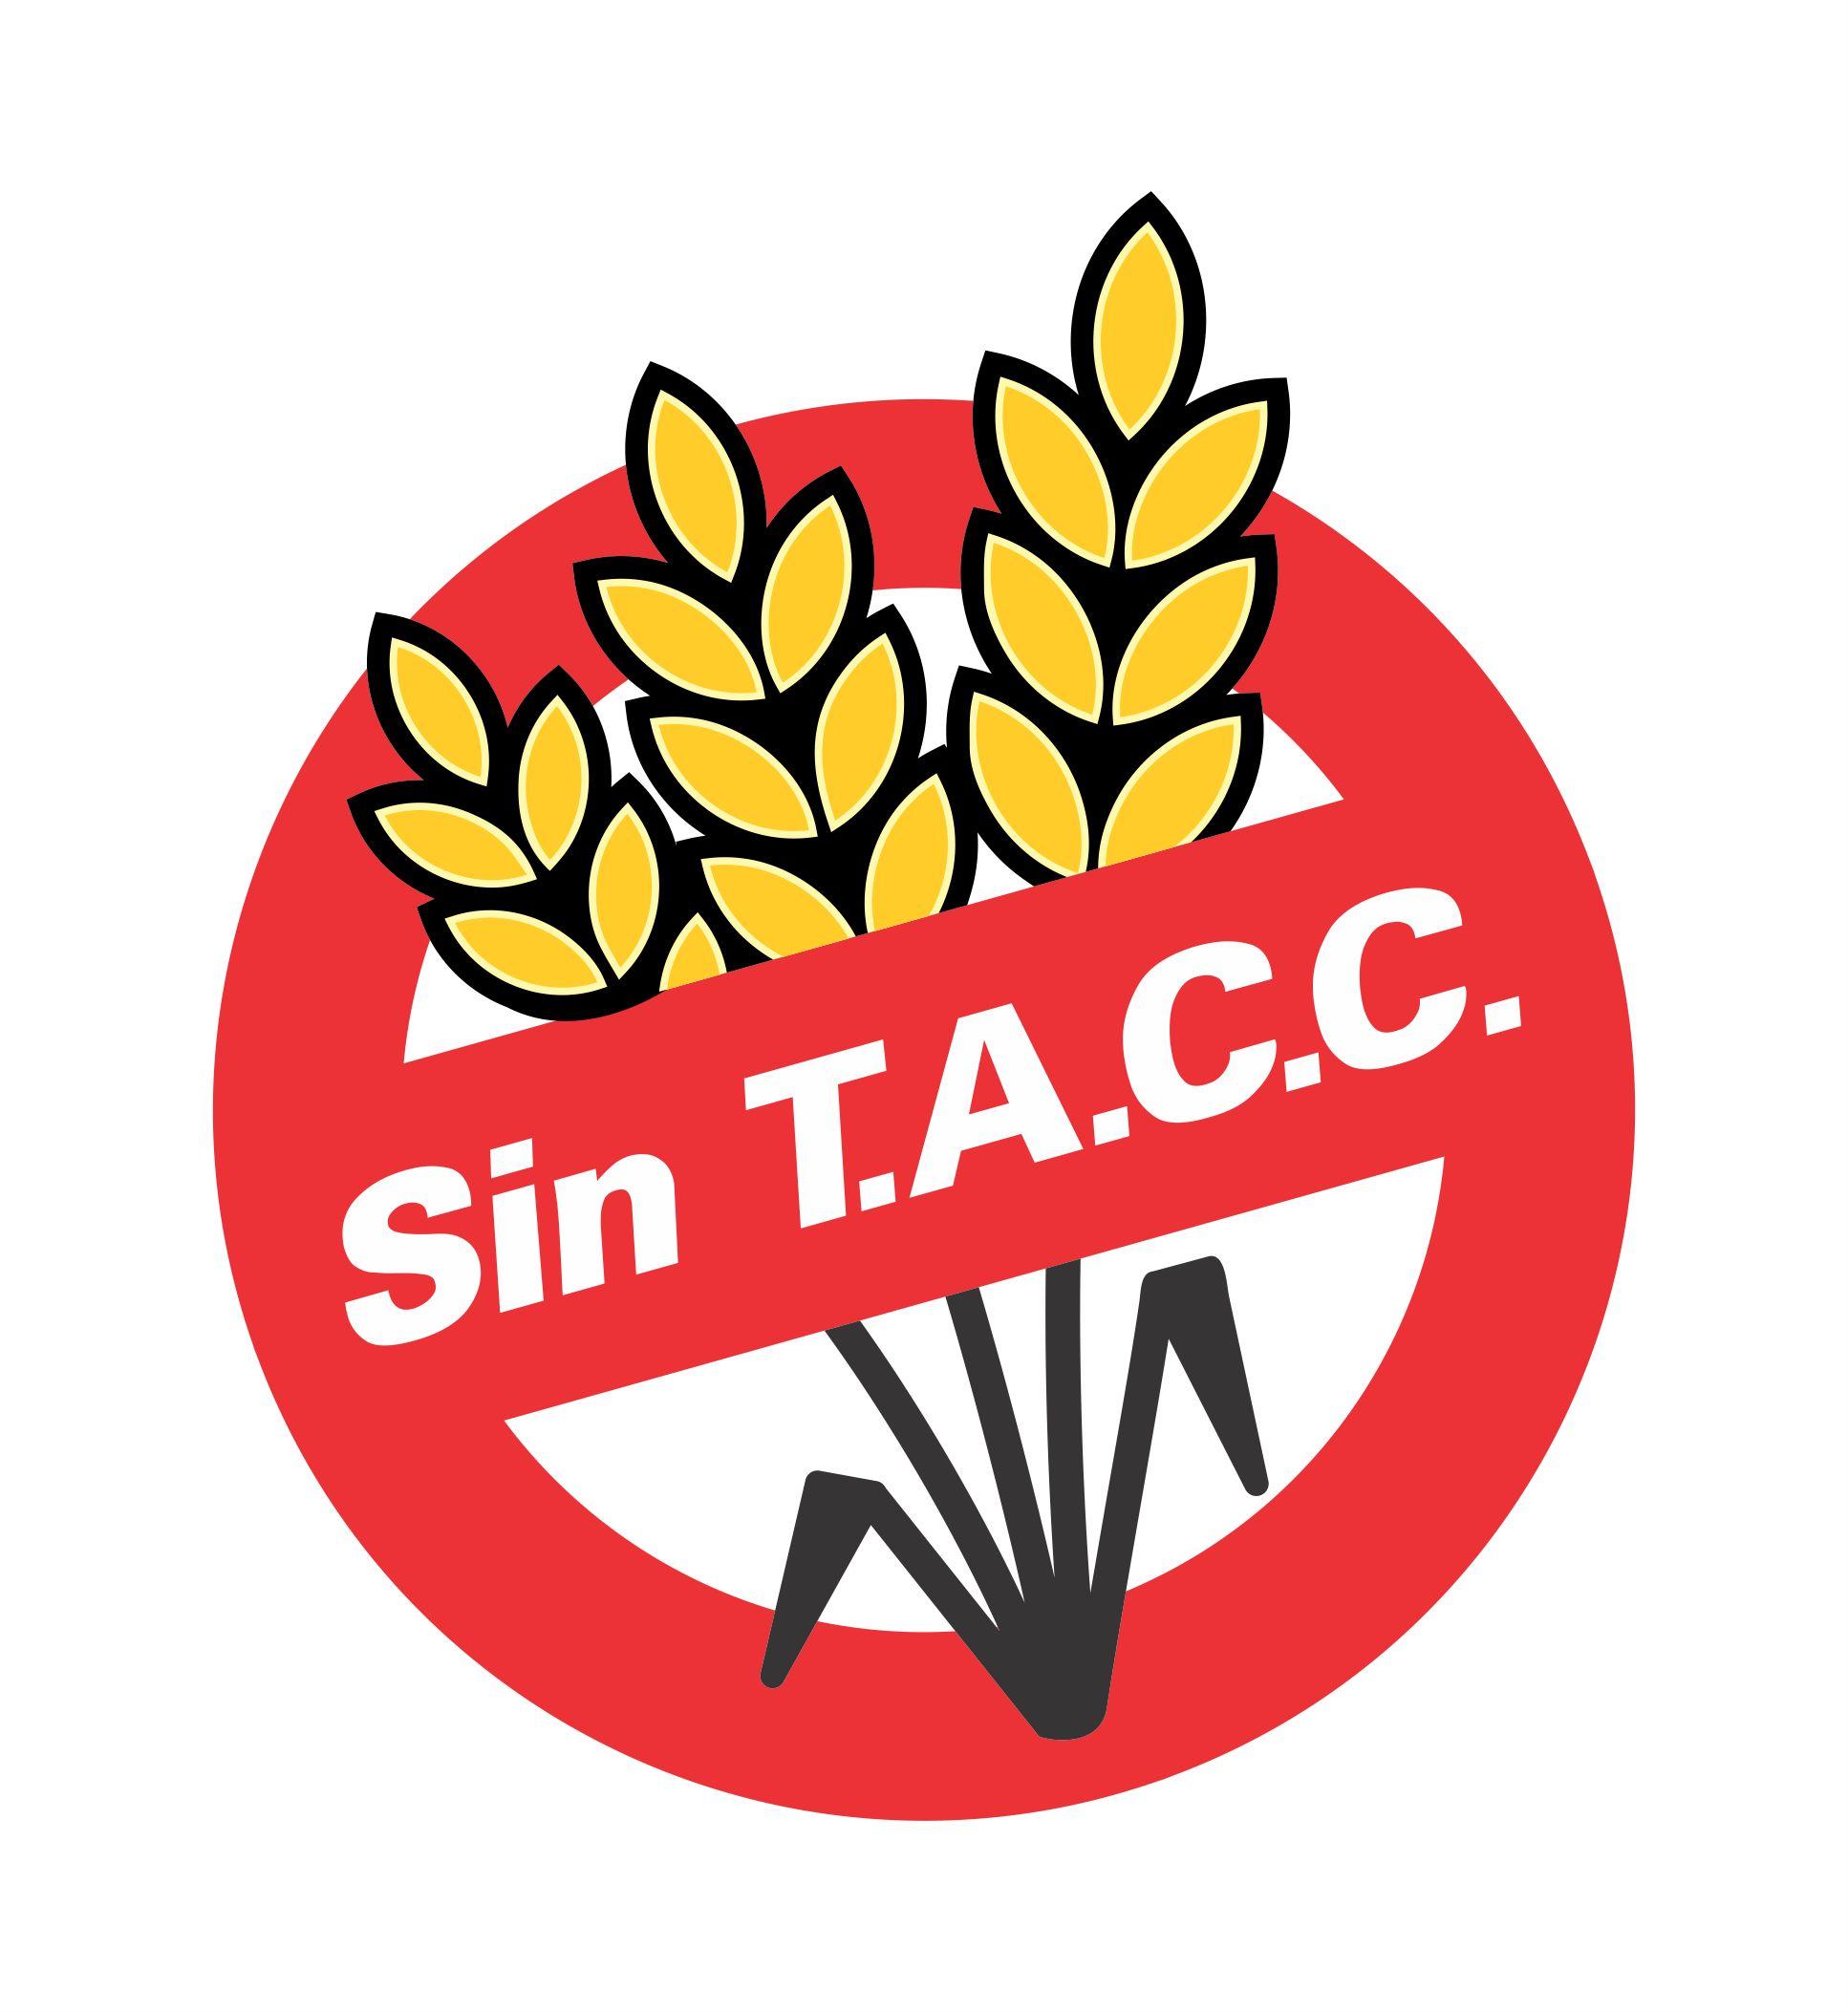 Logo-sin-gluten.jpg